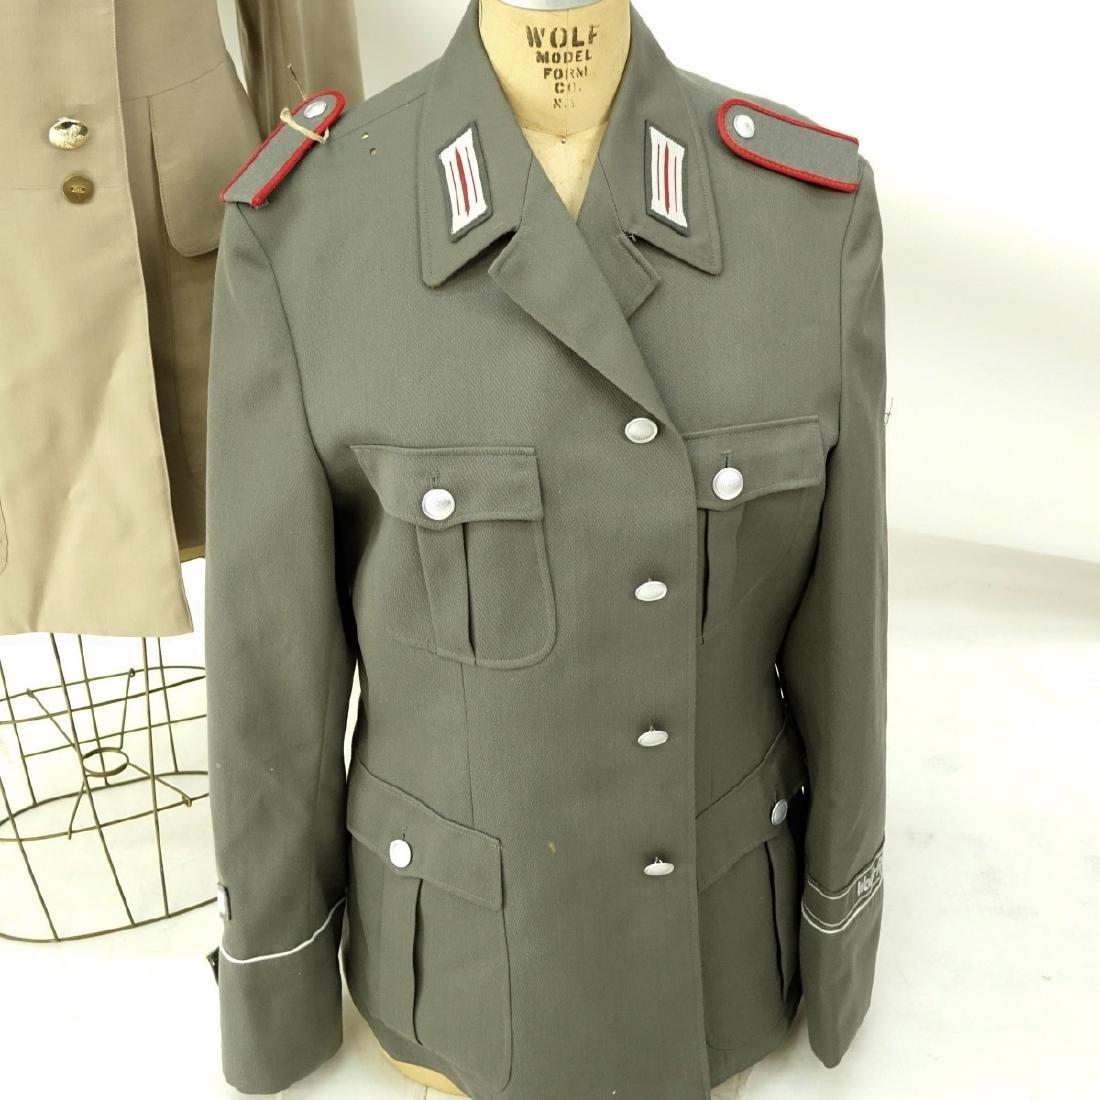 Military Uniforms - 2